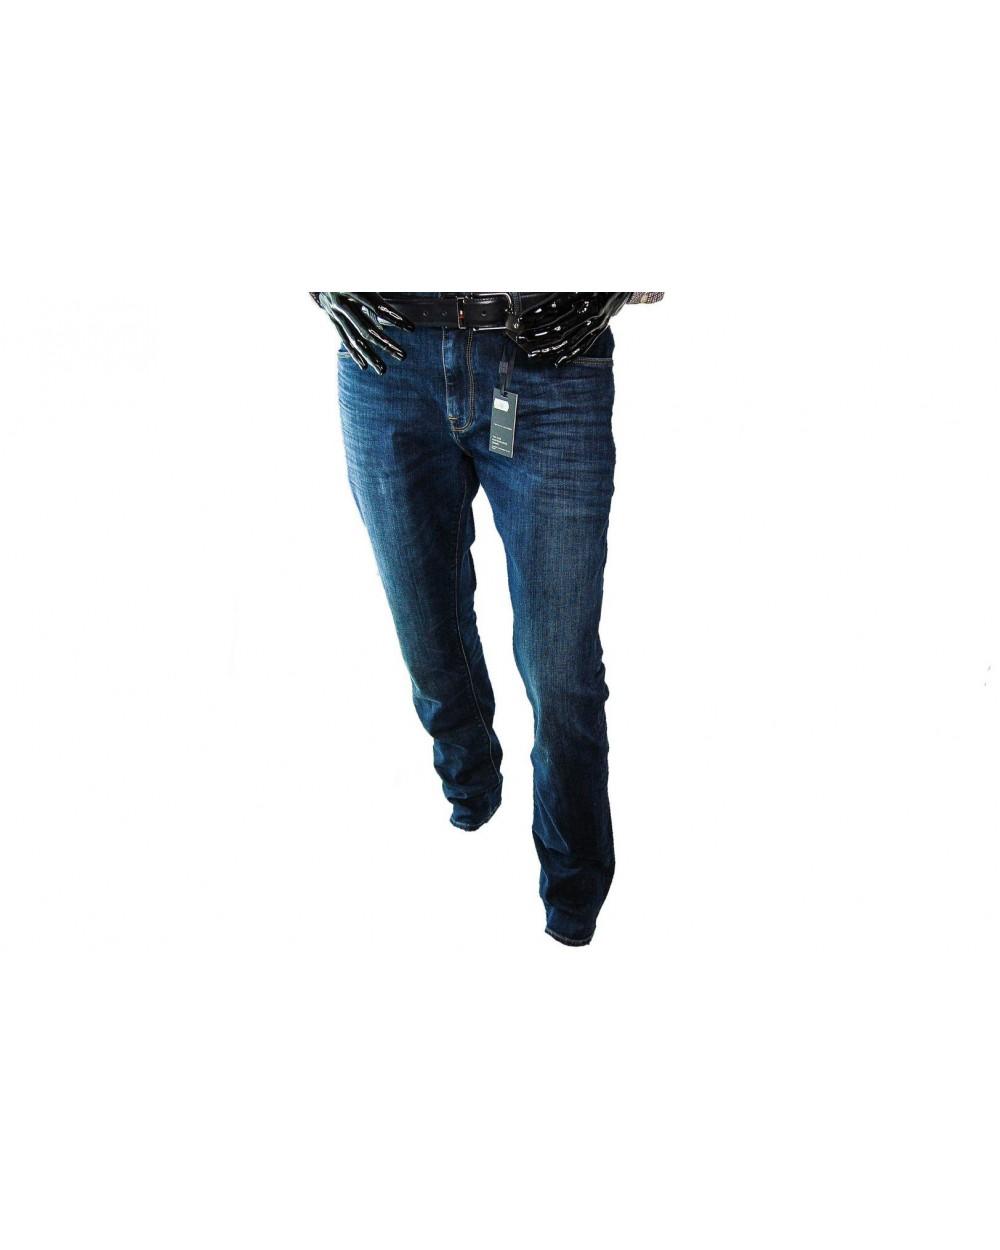 b44e69f60 Spodnie TOMMY HILFIGER- MW0MW08674 911 granatowe